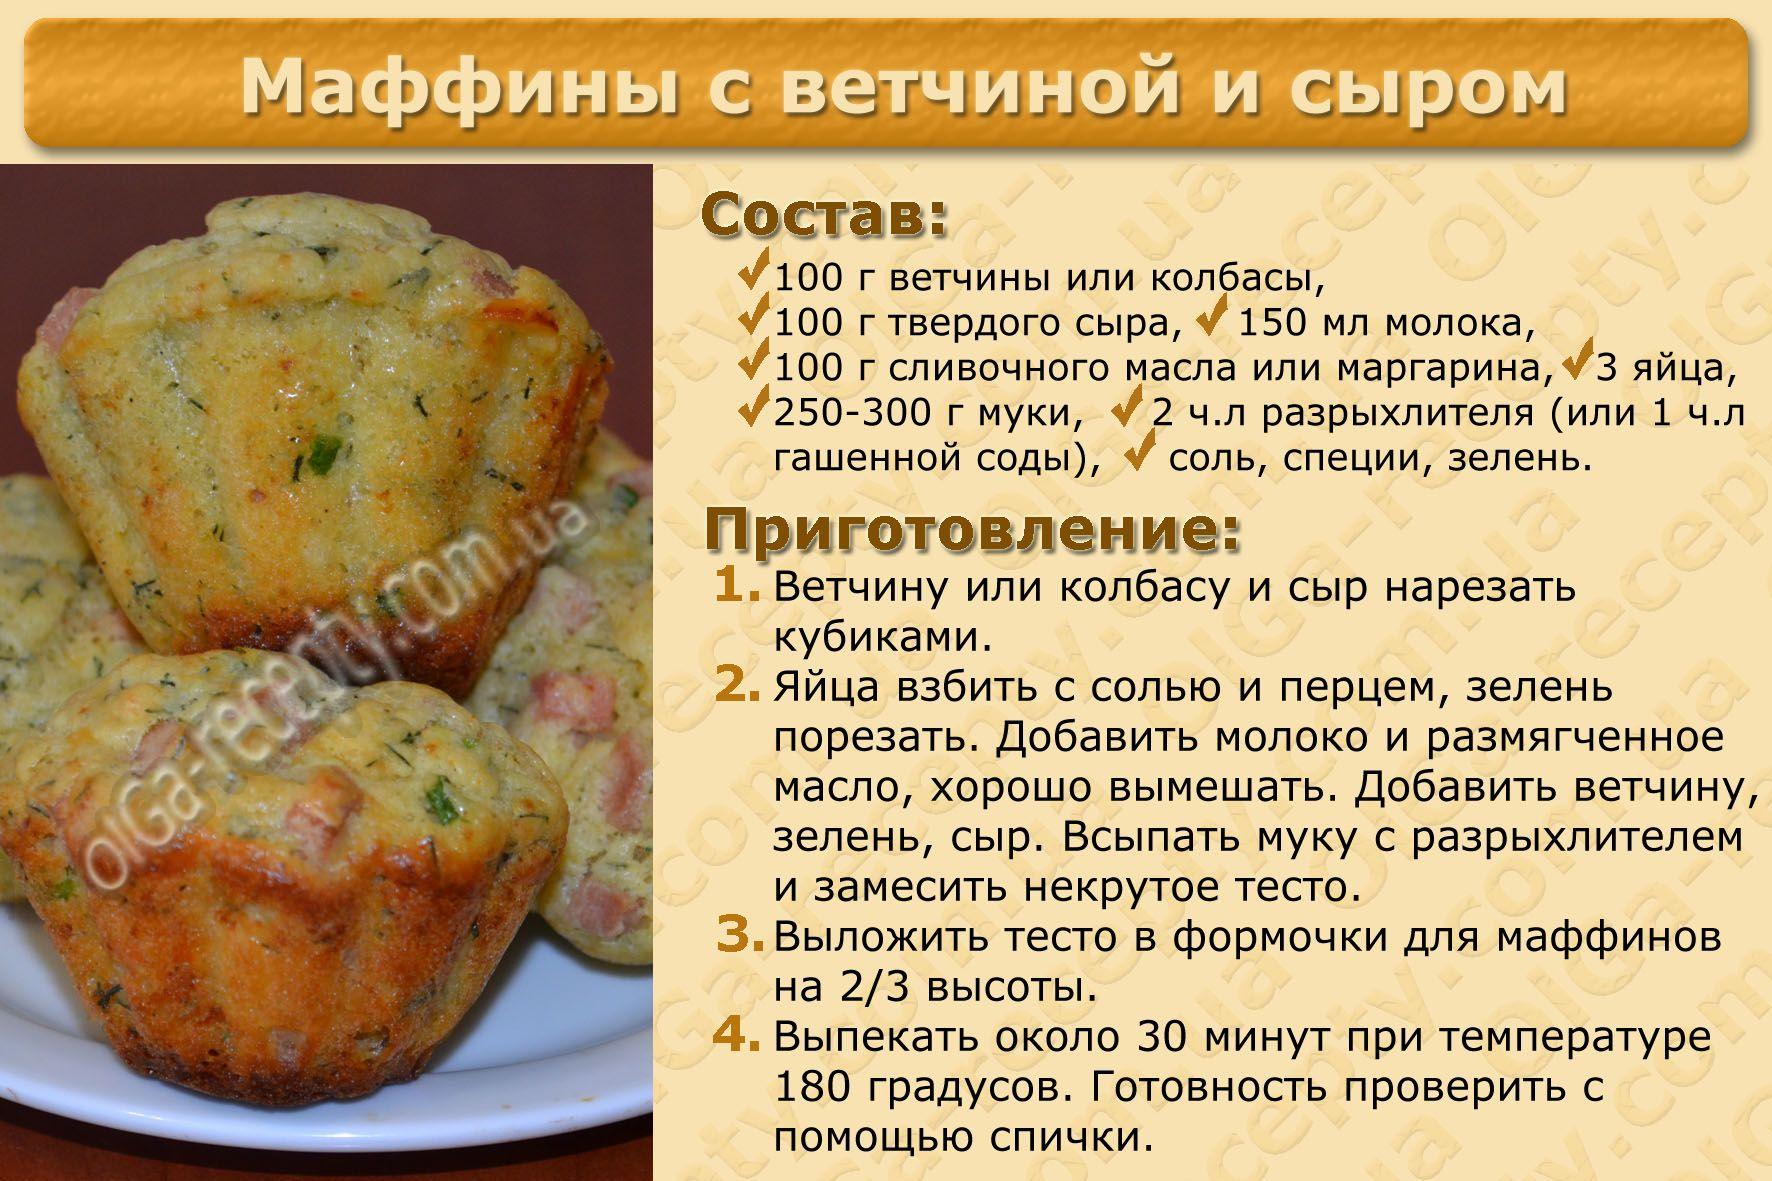 Картинка с рецептом